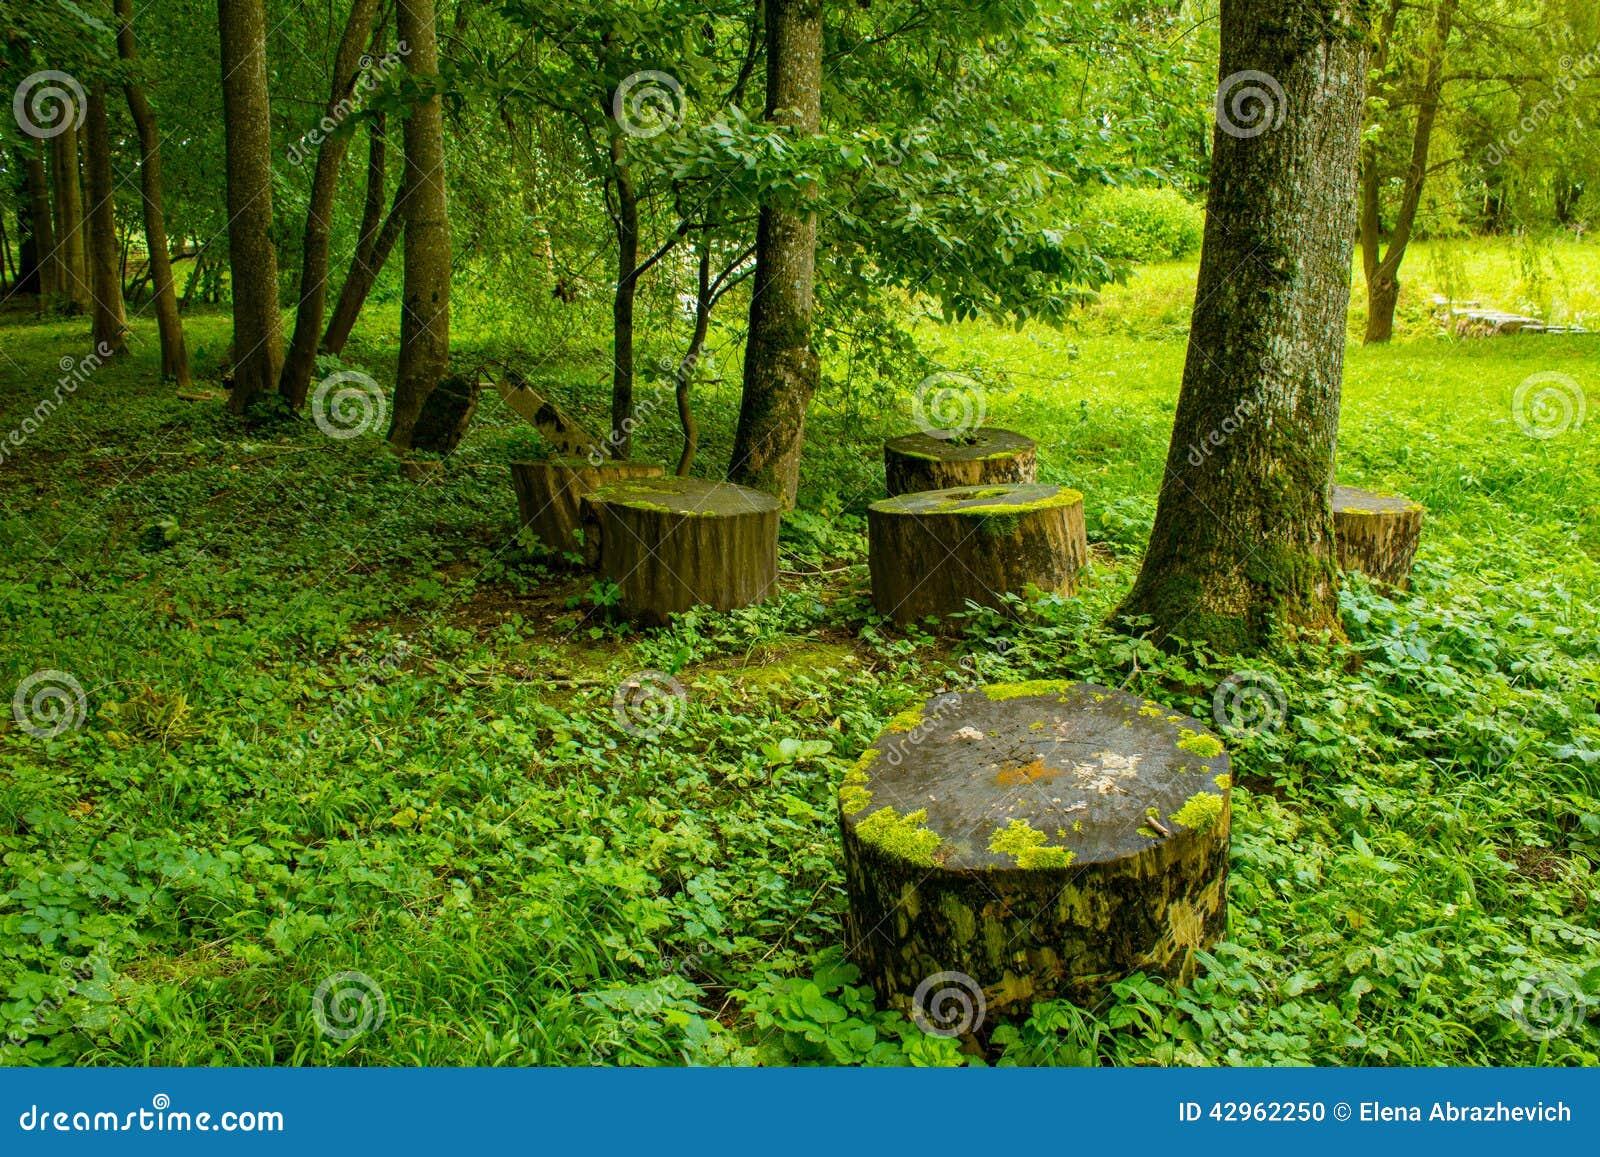 Drzewa i fiszorki w parku